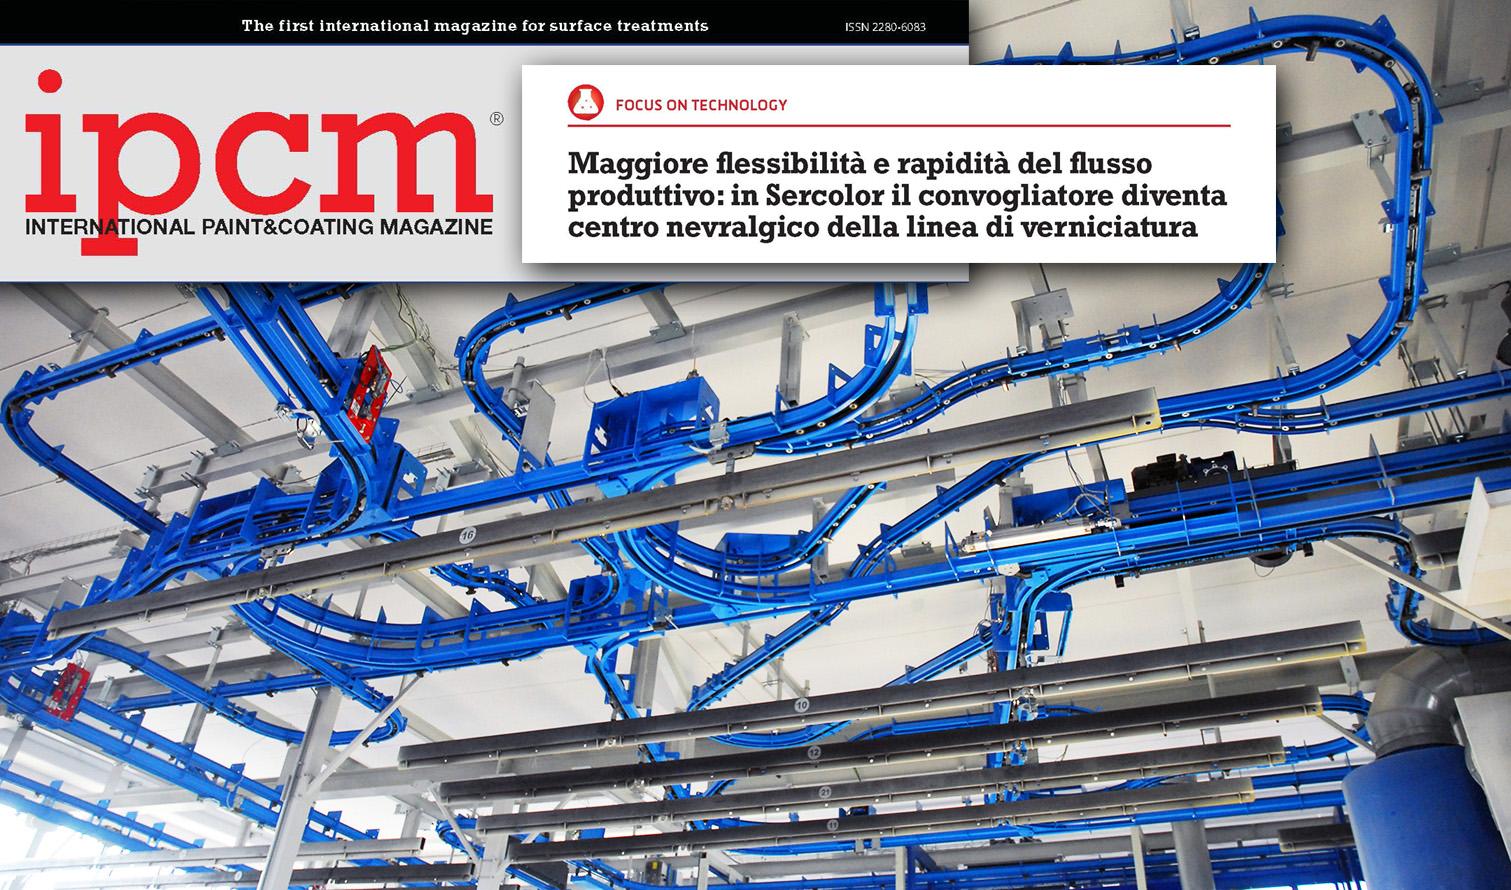 covernewsletteripcm59